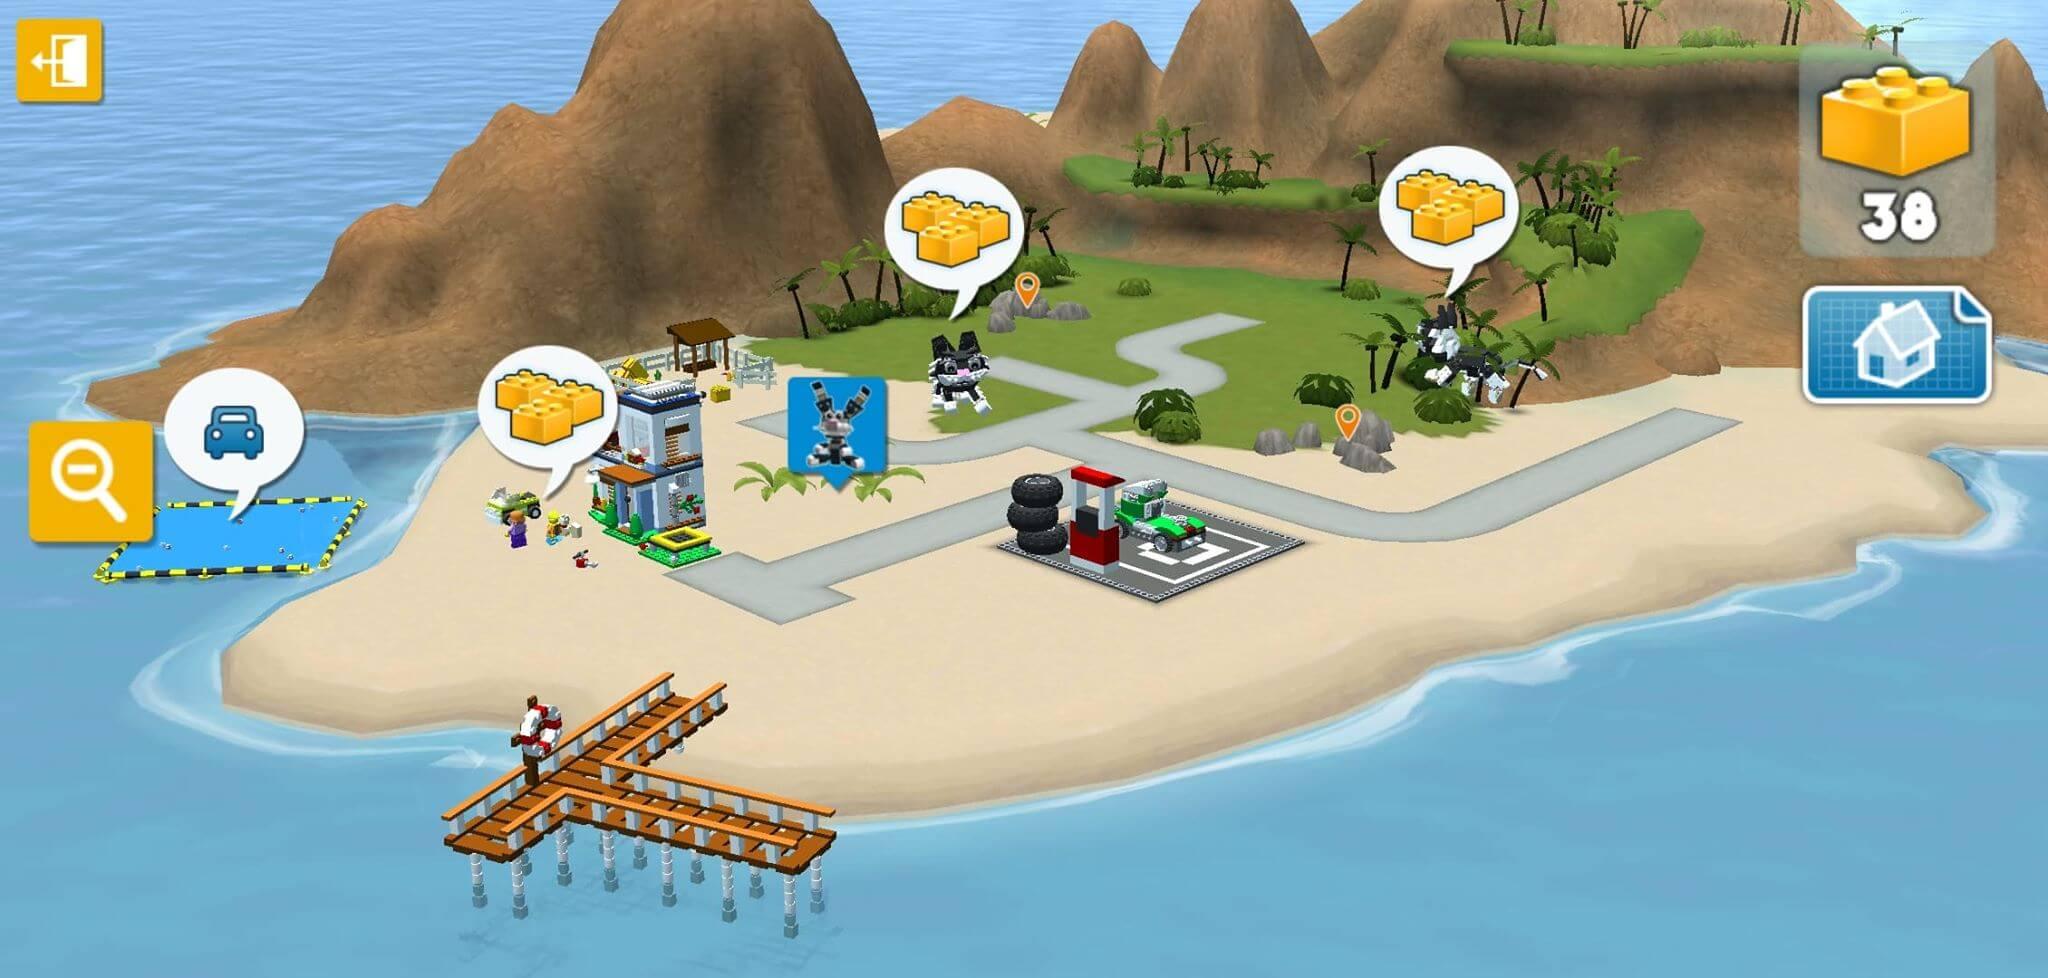 lego creator islands build play explore pc